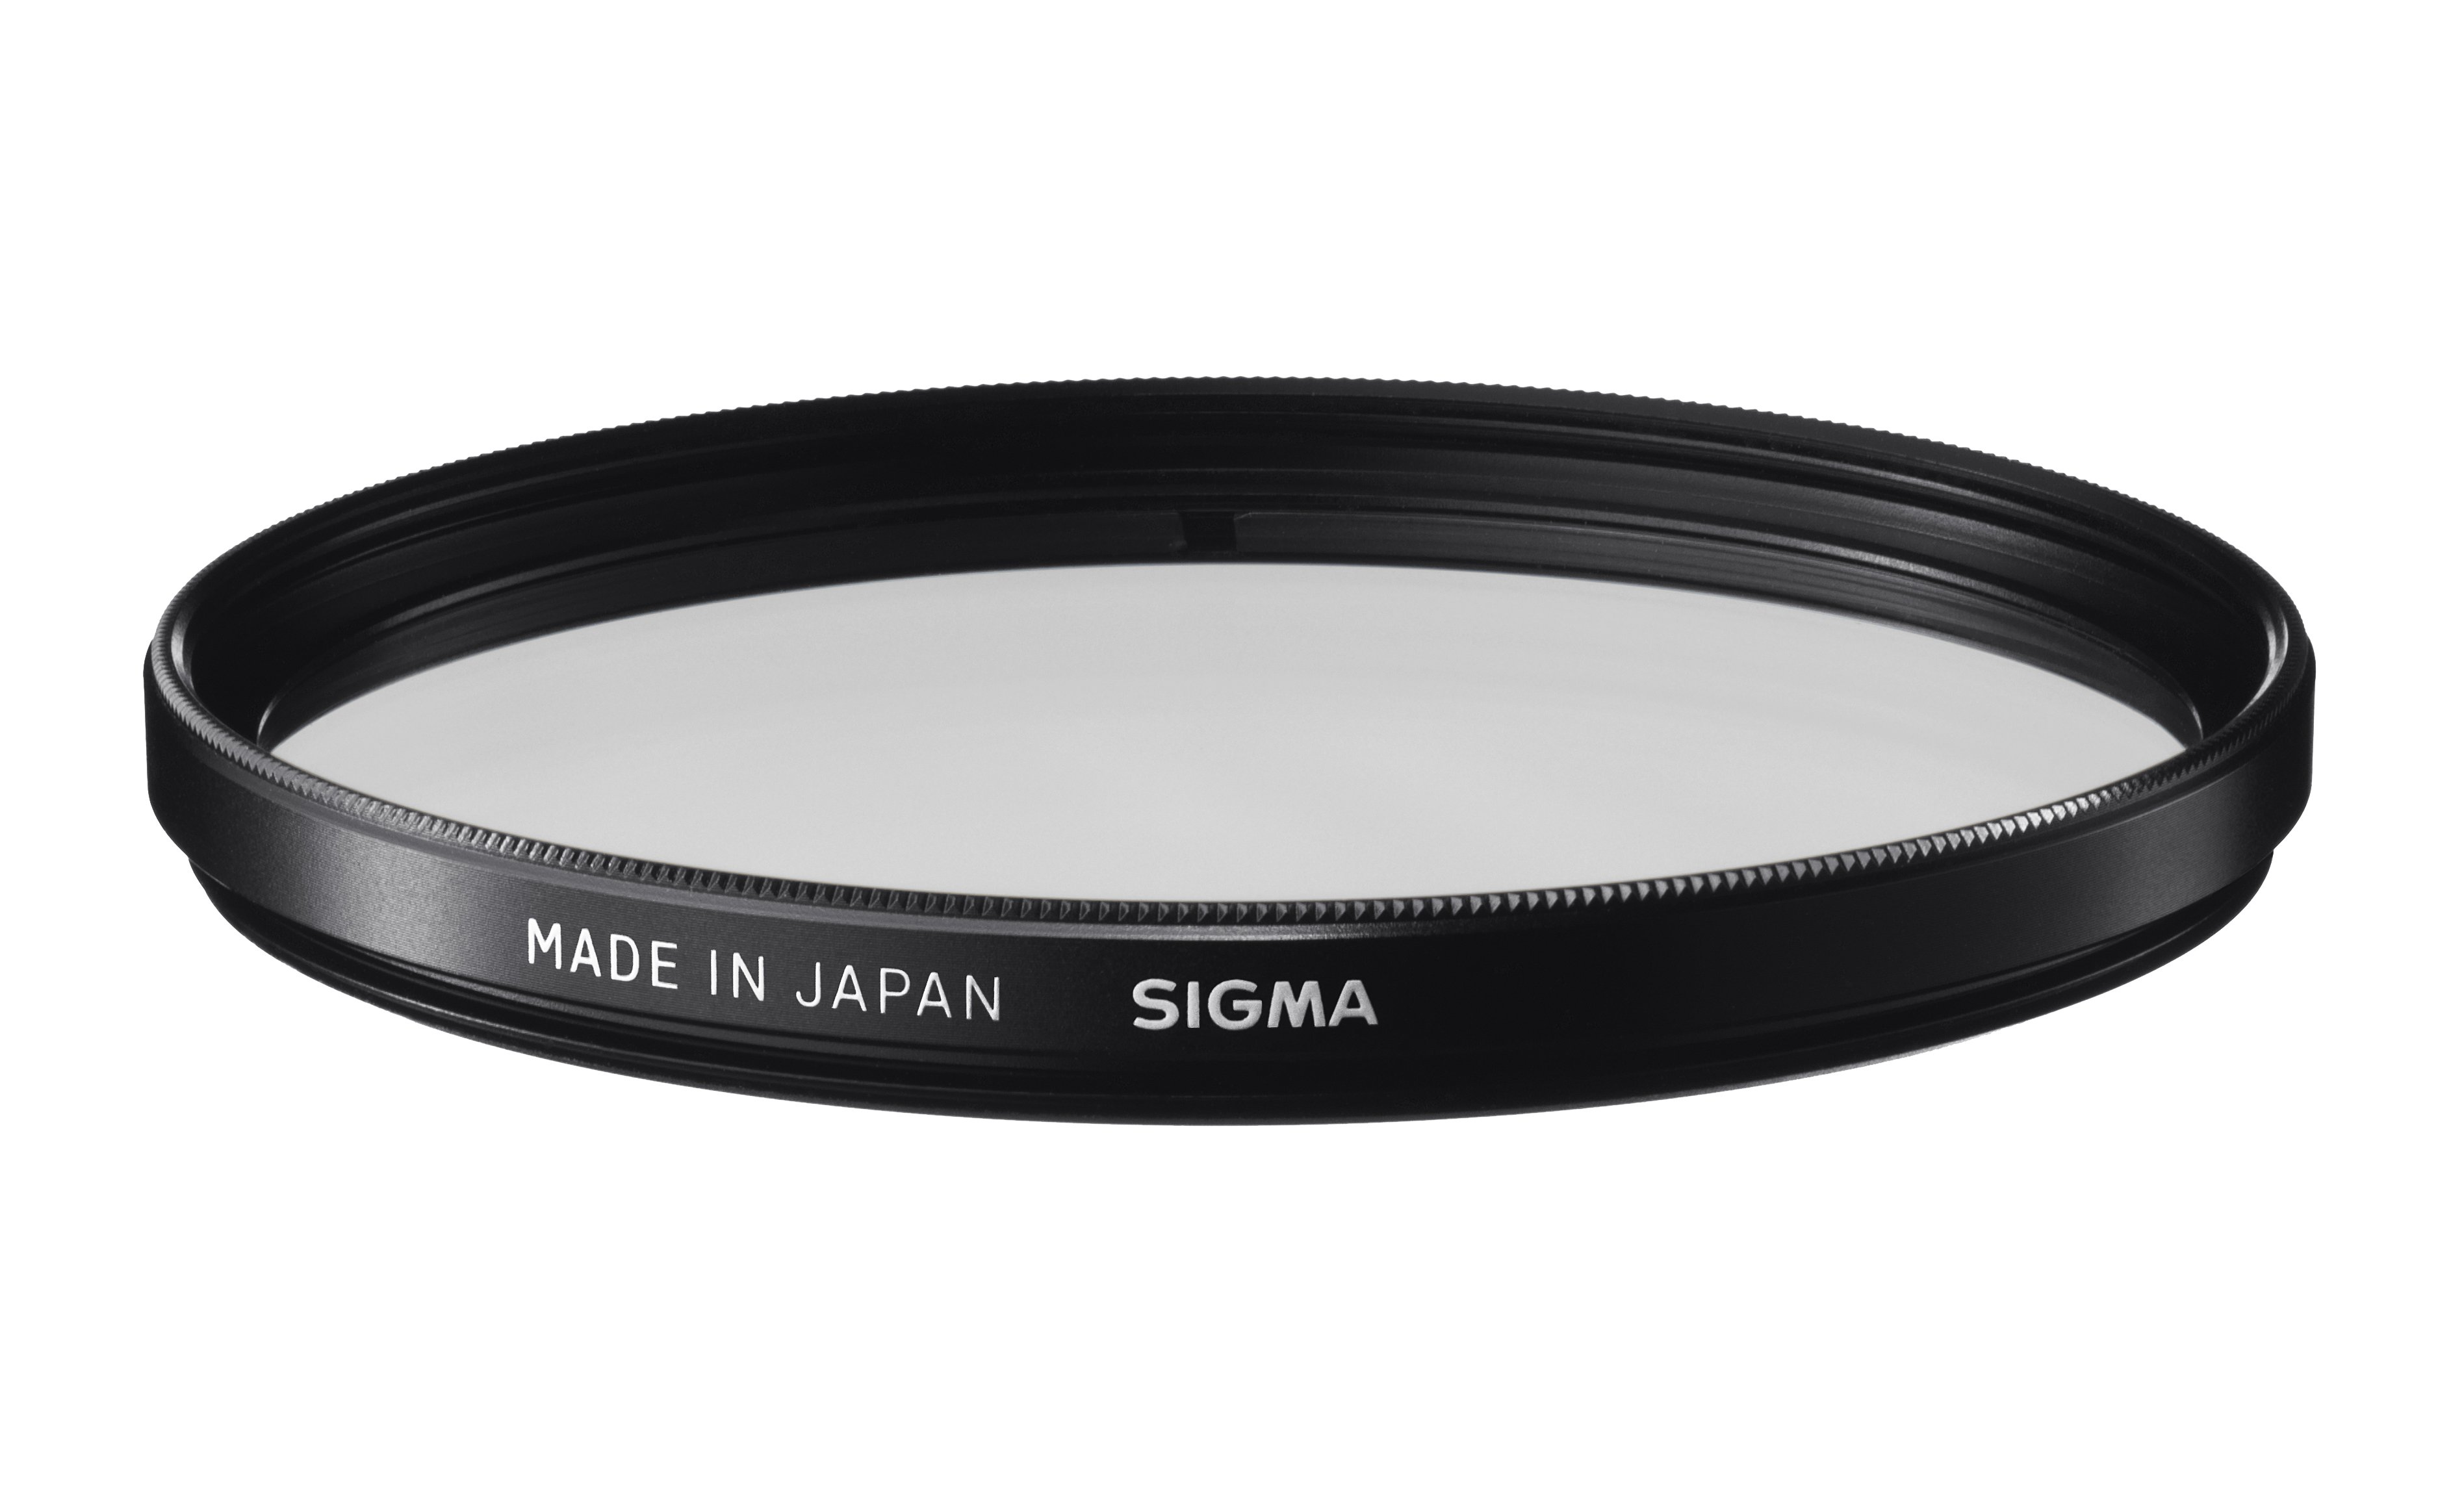 SIGMA filtr UV 67 mm WR